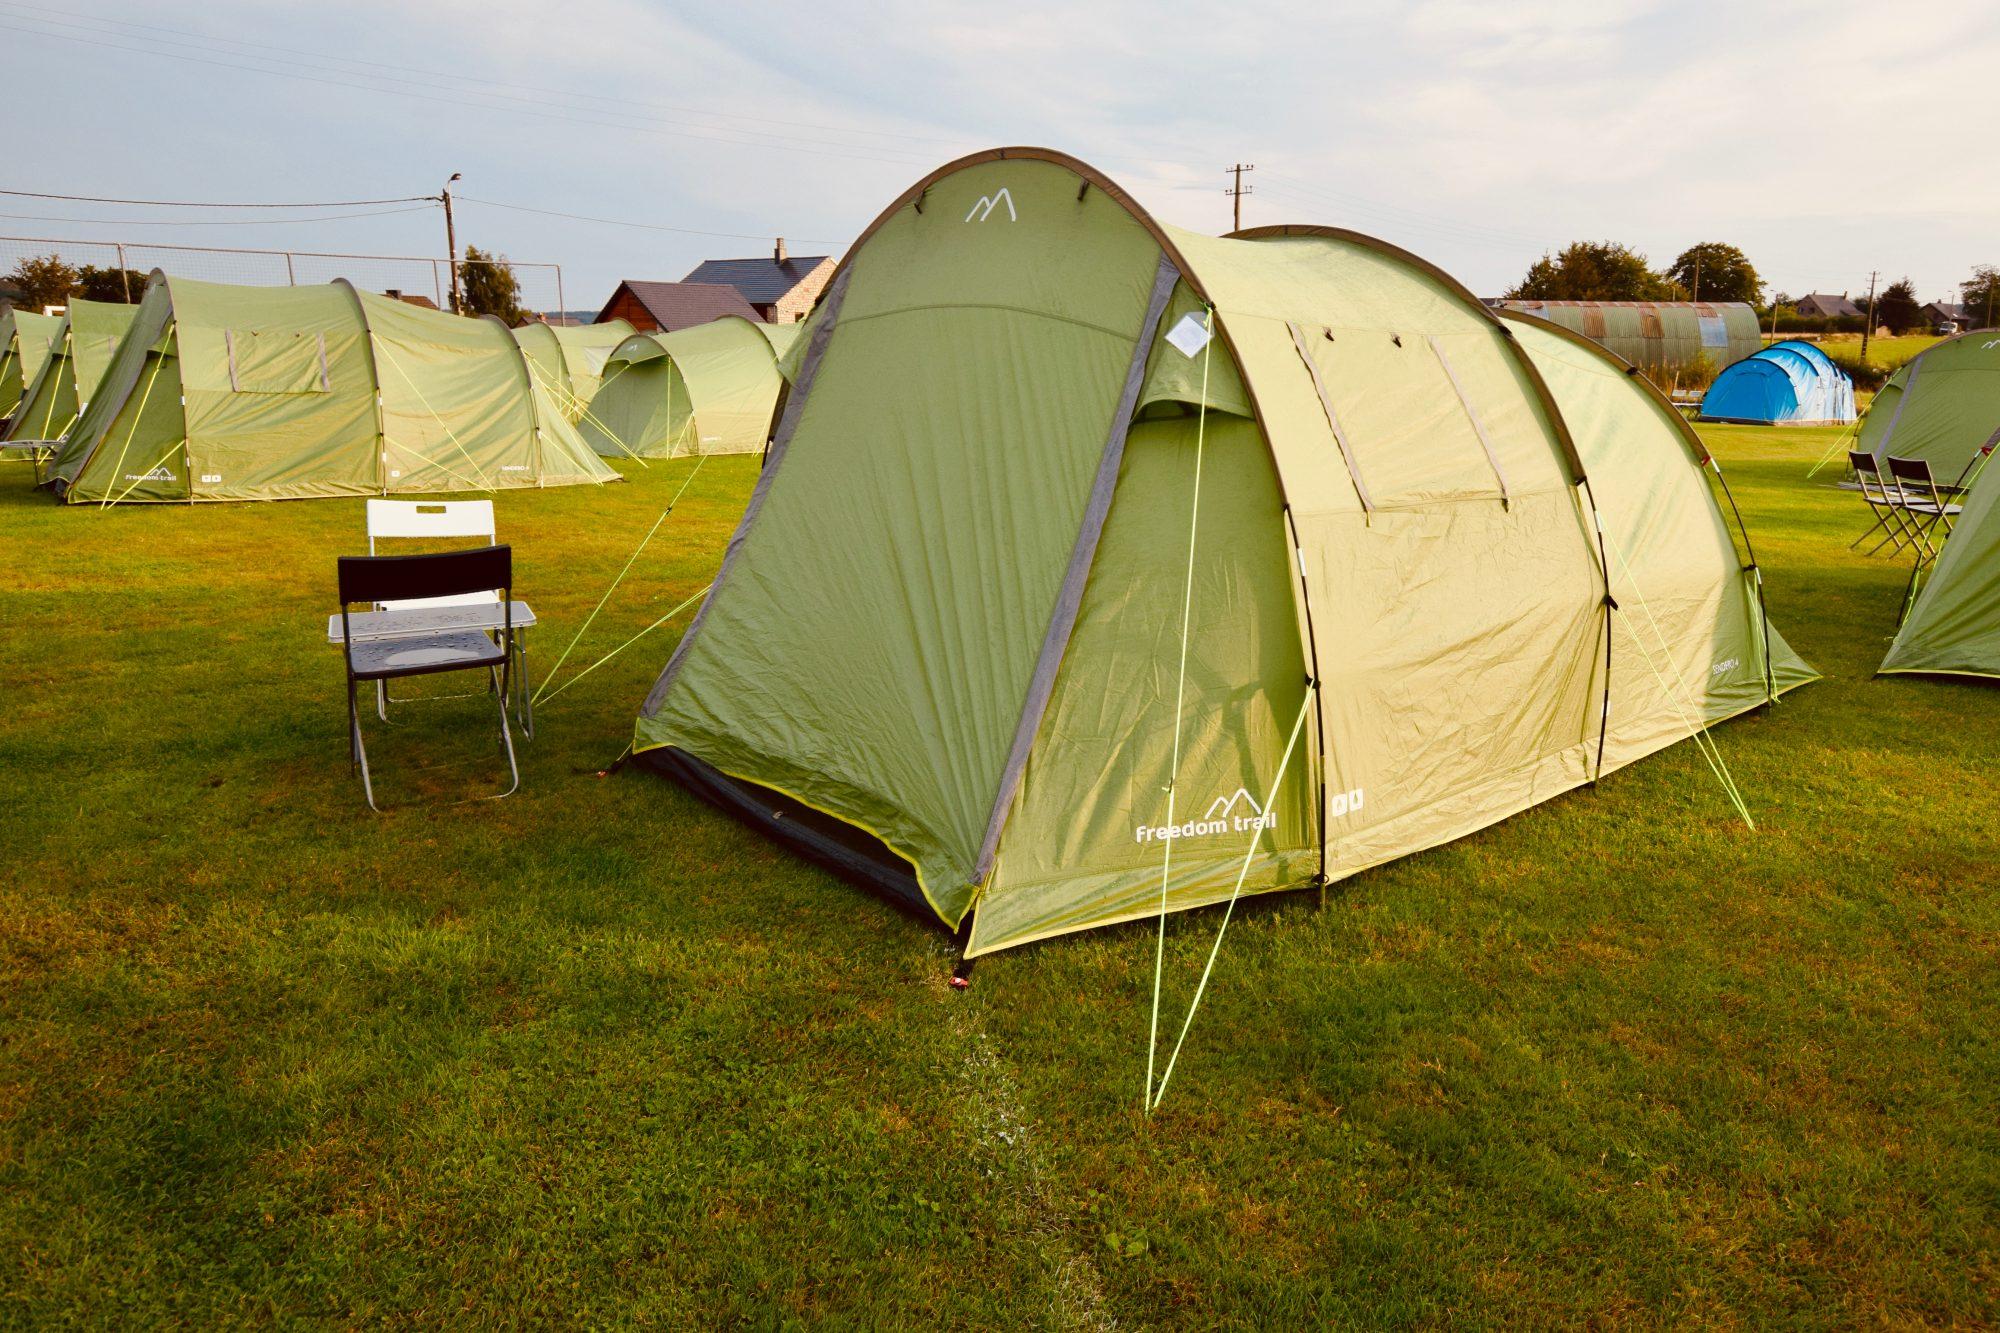 Private Pre-Erected Tents